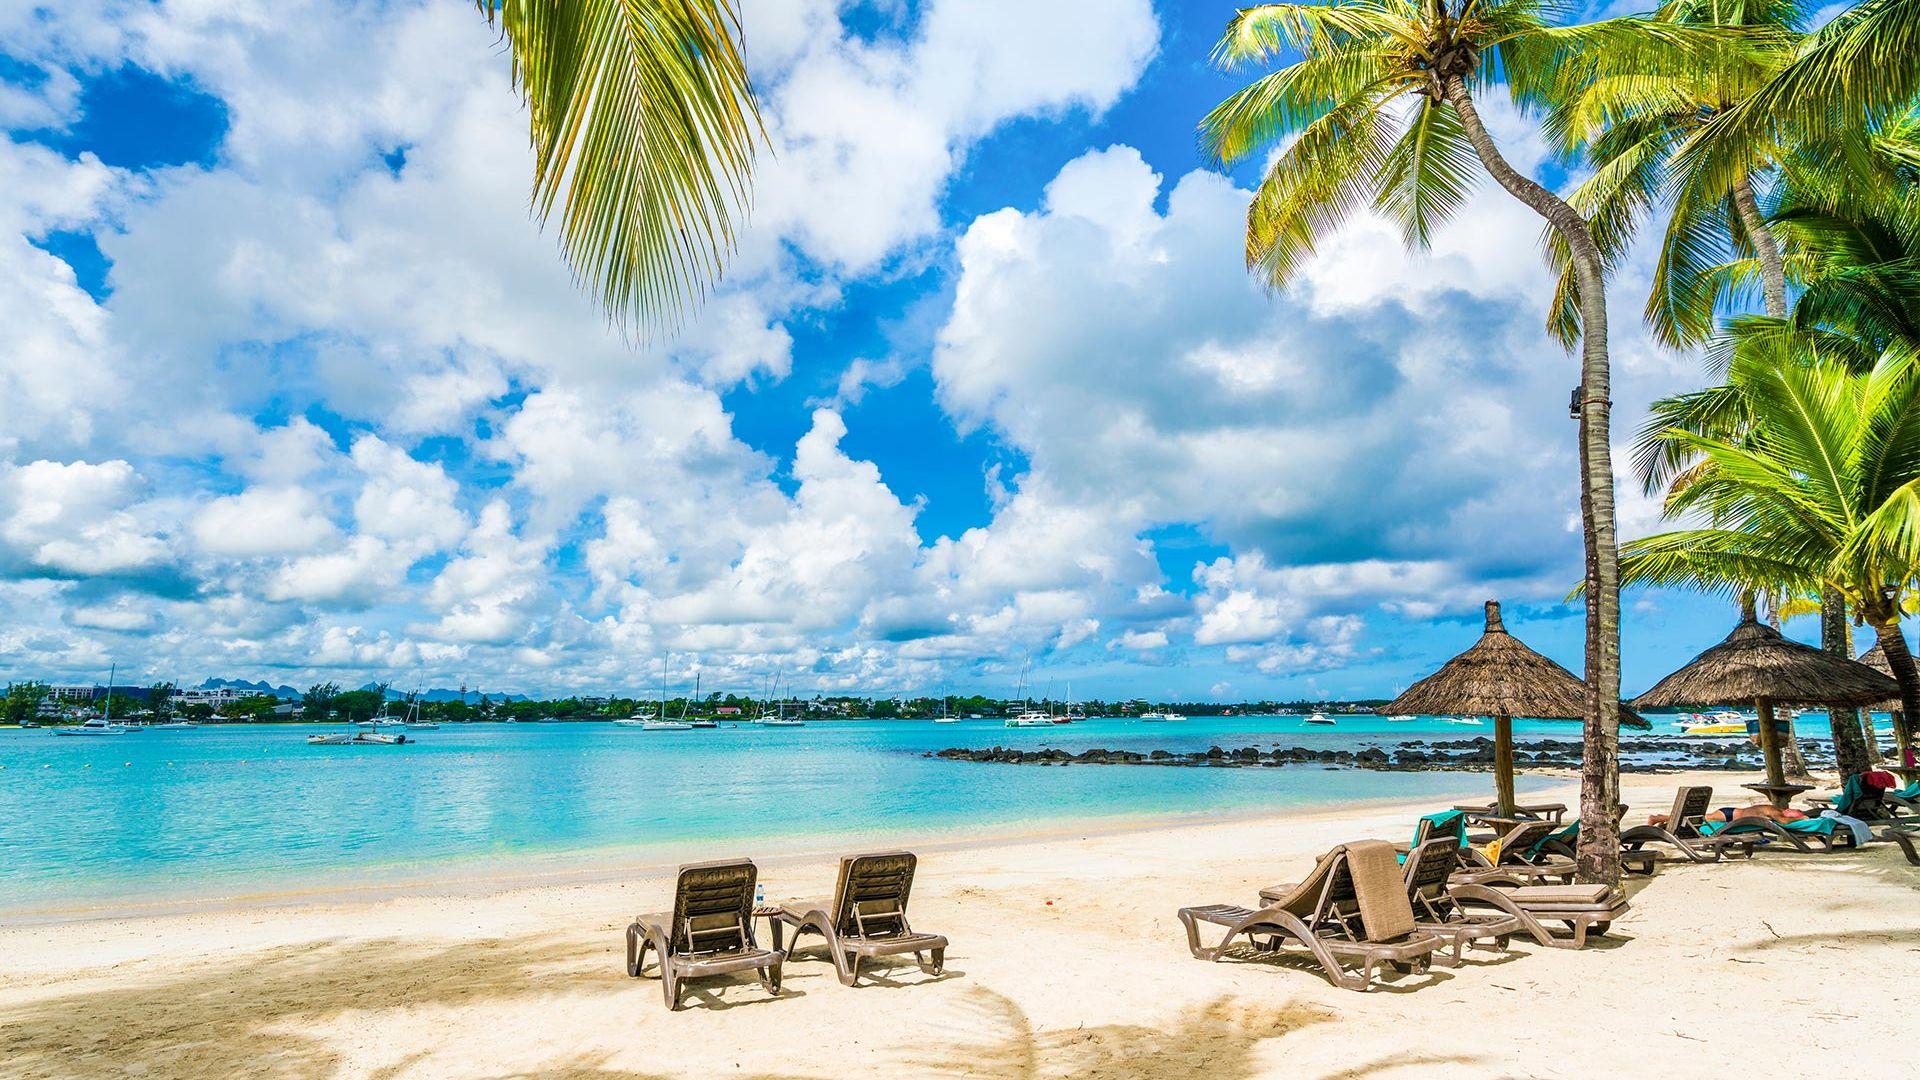 Revelion 2022 - Sejur Luxury Constance Belle Mare Plage, Mauritius, 12 zile - cu Razvan Pascu